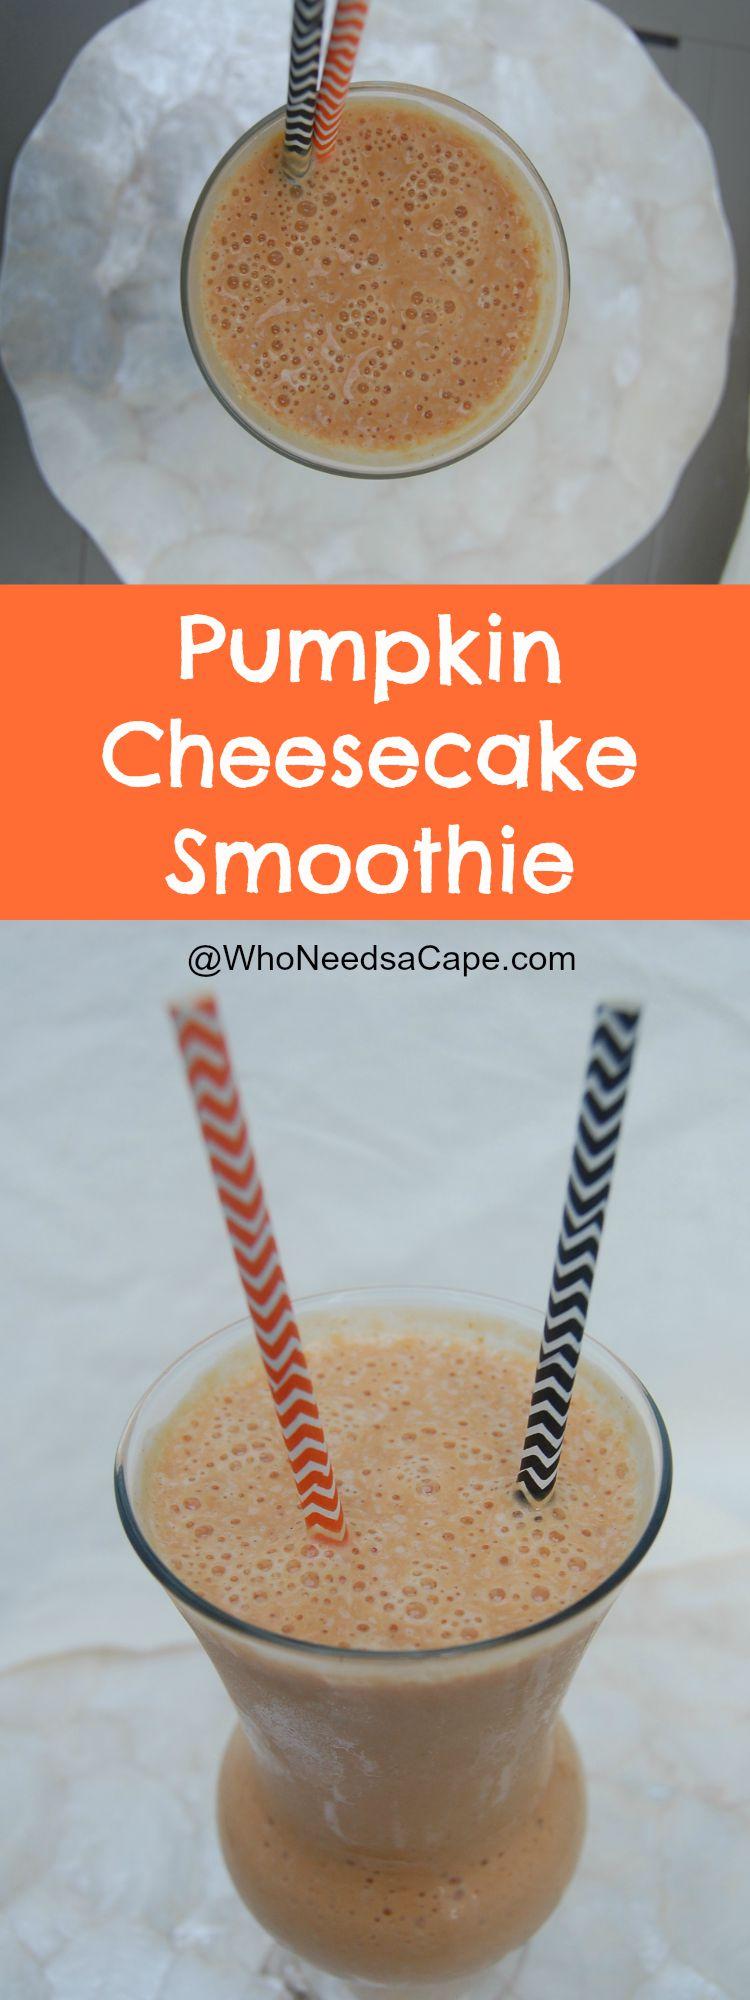 Pumpkin Cheesecake Smoothie - Who Needs A Cape?